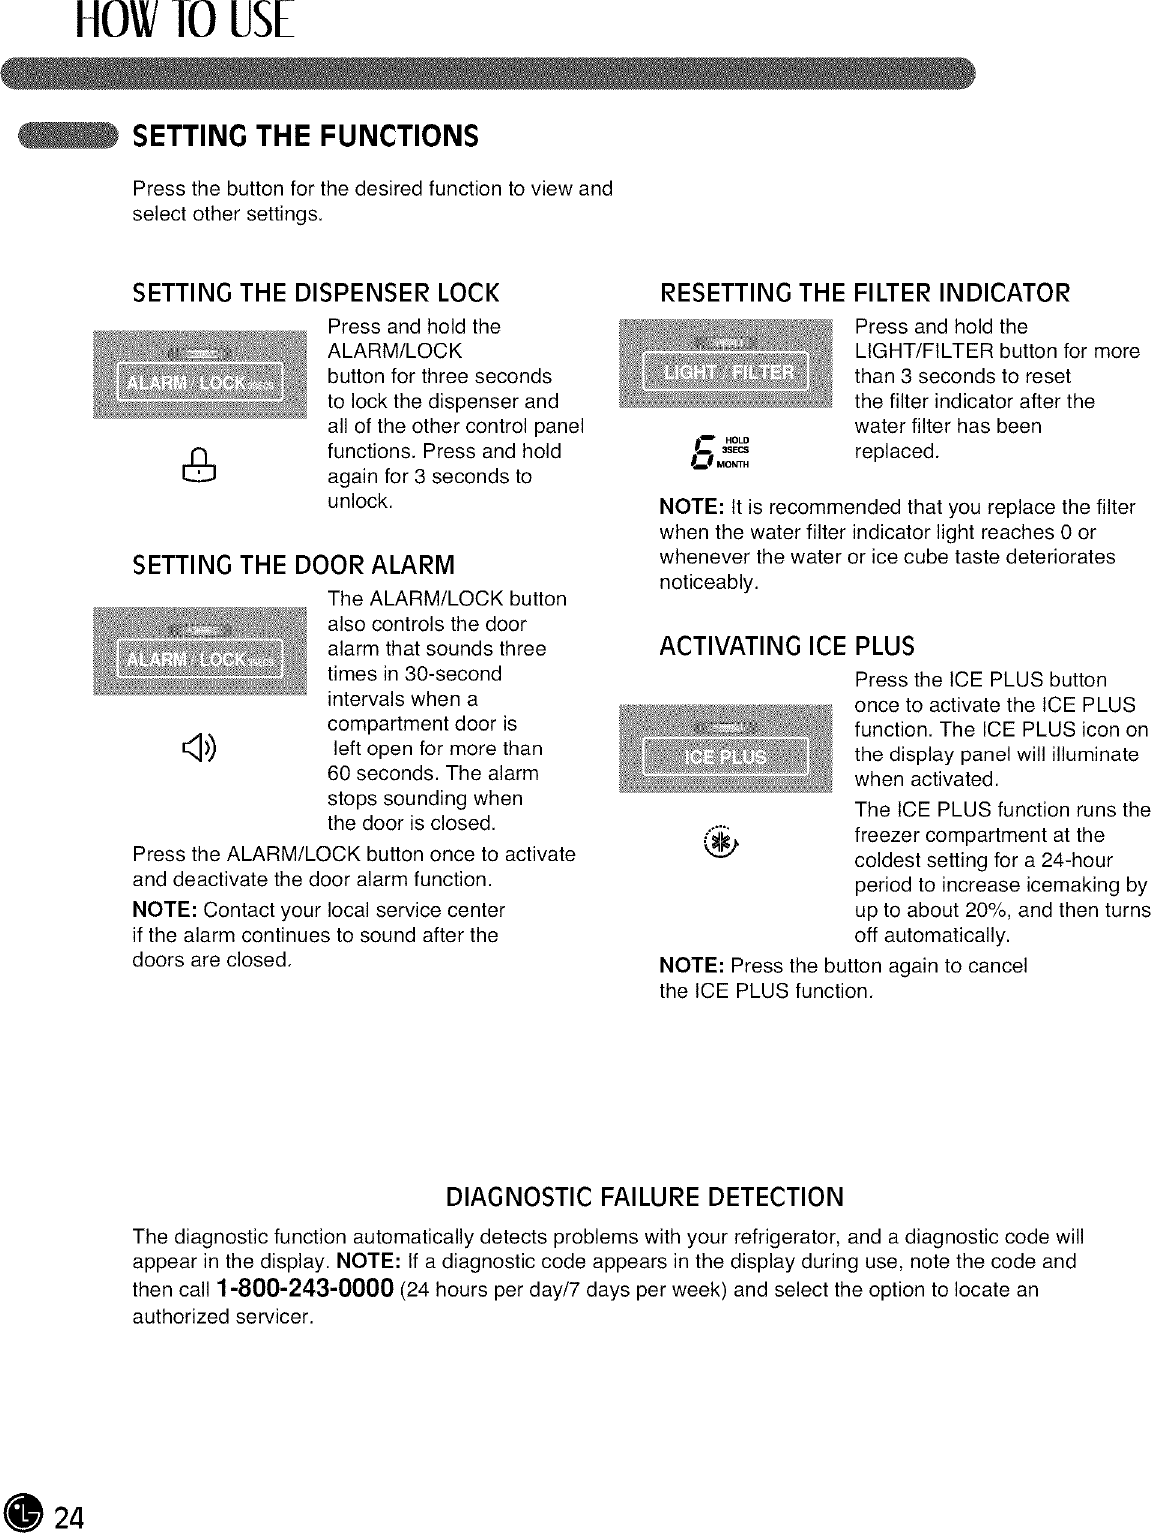 LG LFX25971SB/01 User Manual REFRIGERATOR Manuals And Guides